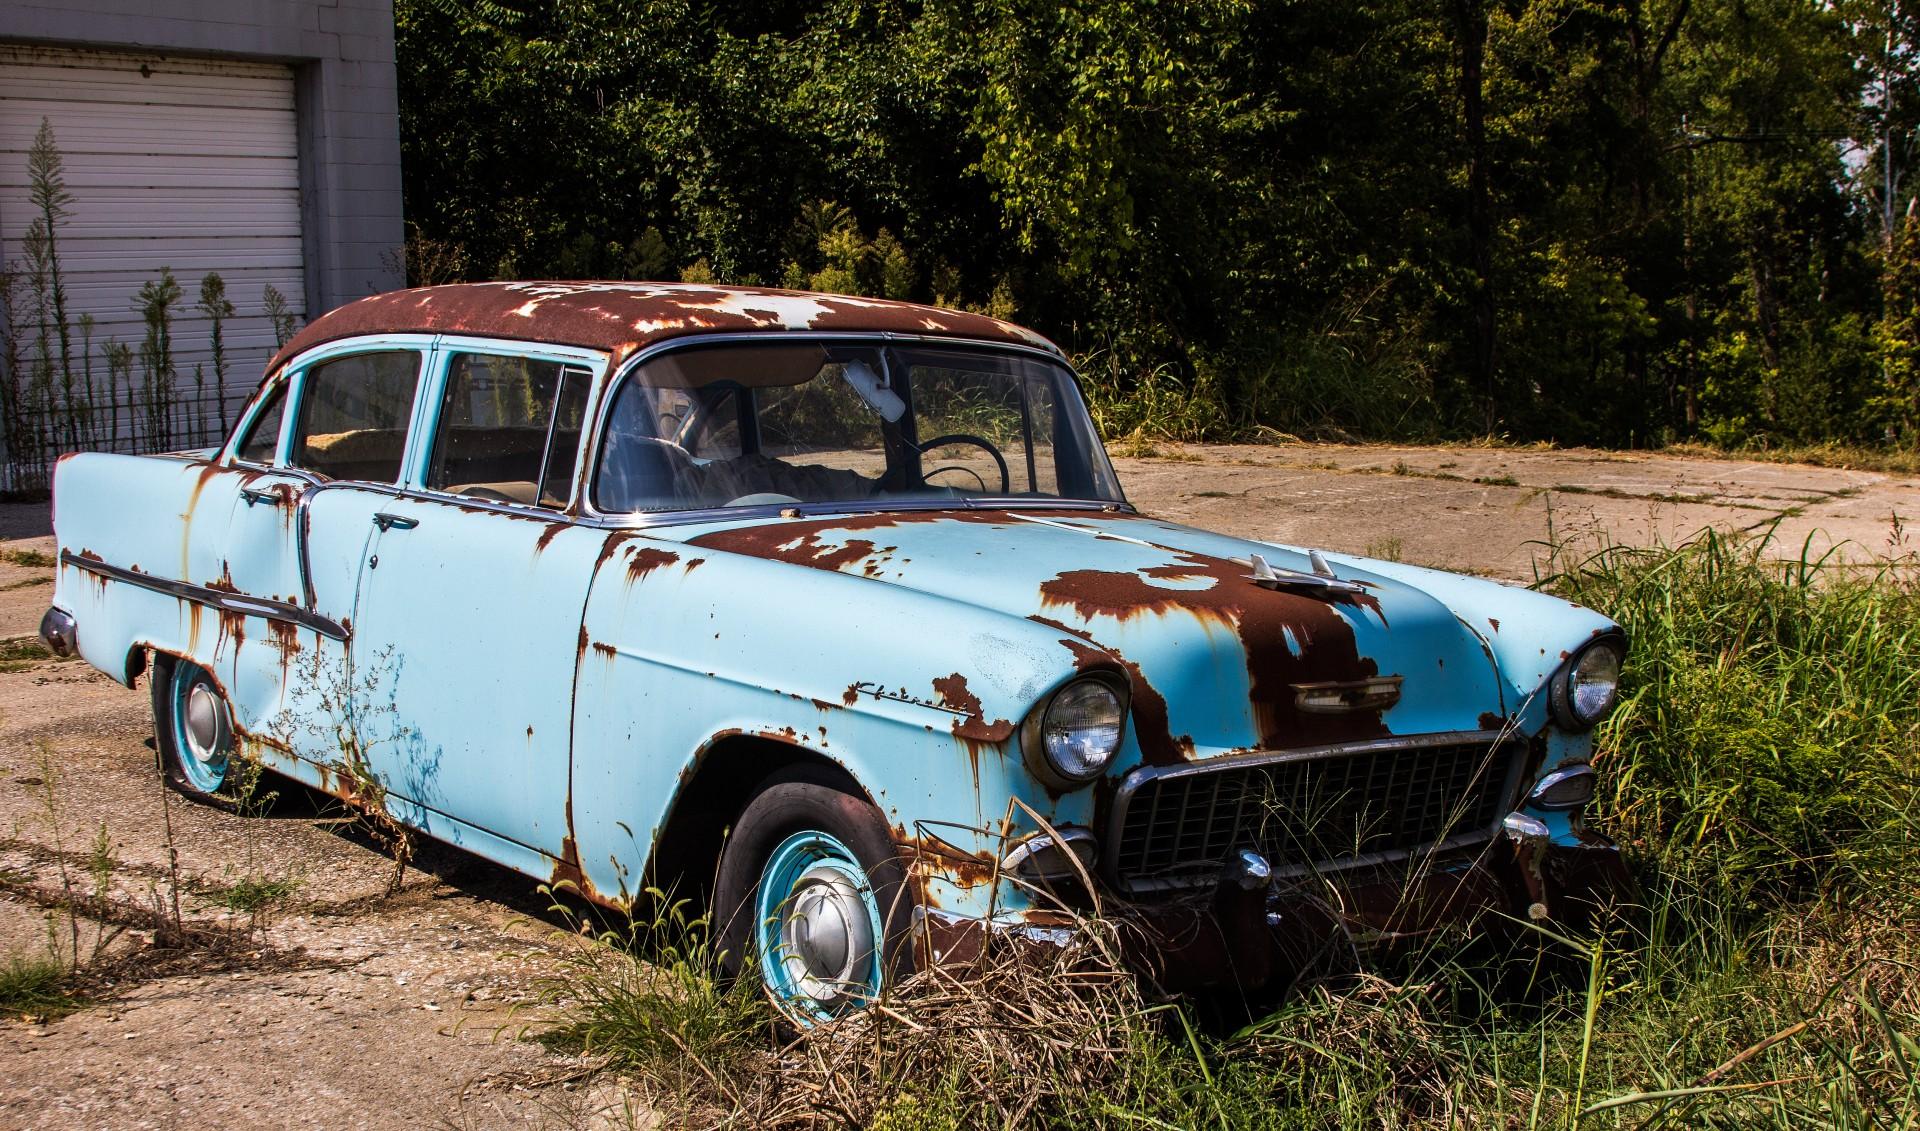 old-rusty-car.jpg